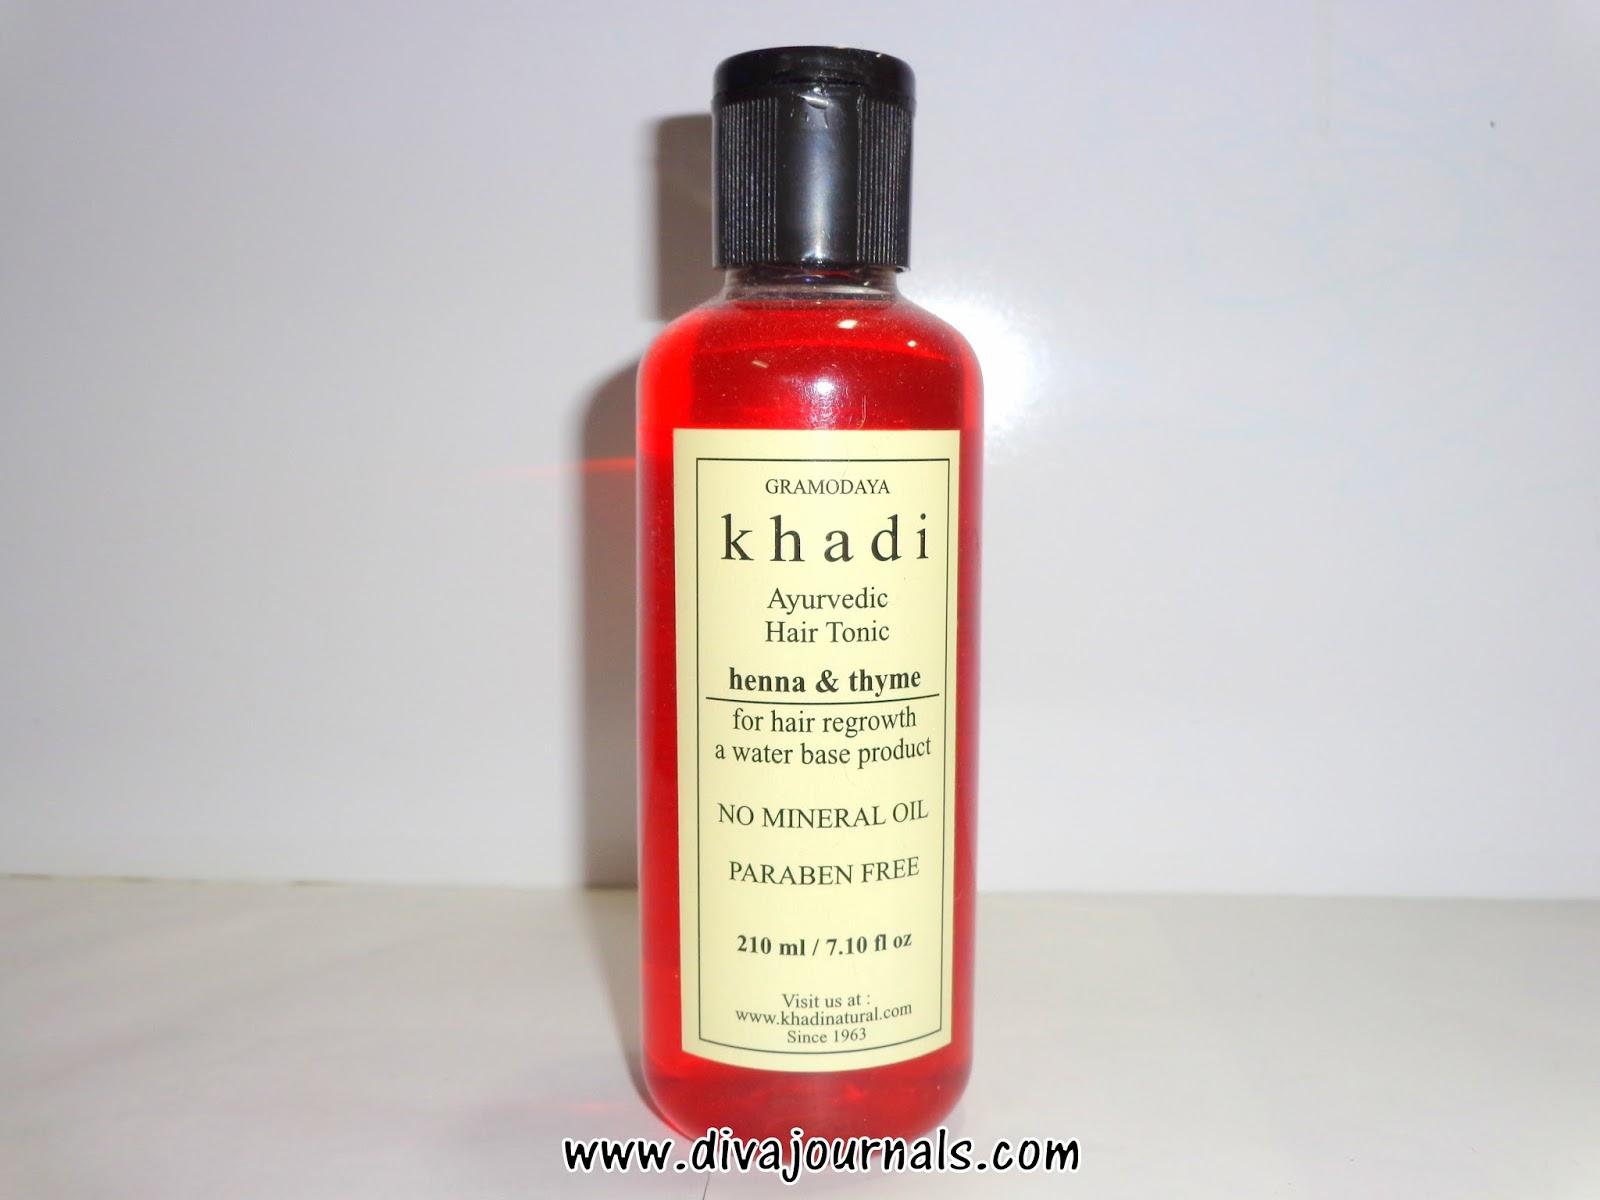 Khadi Henna & Thyme Ayurvedic Hair Regrowth Hair Tonic